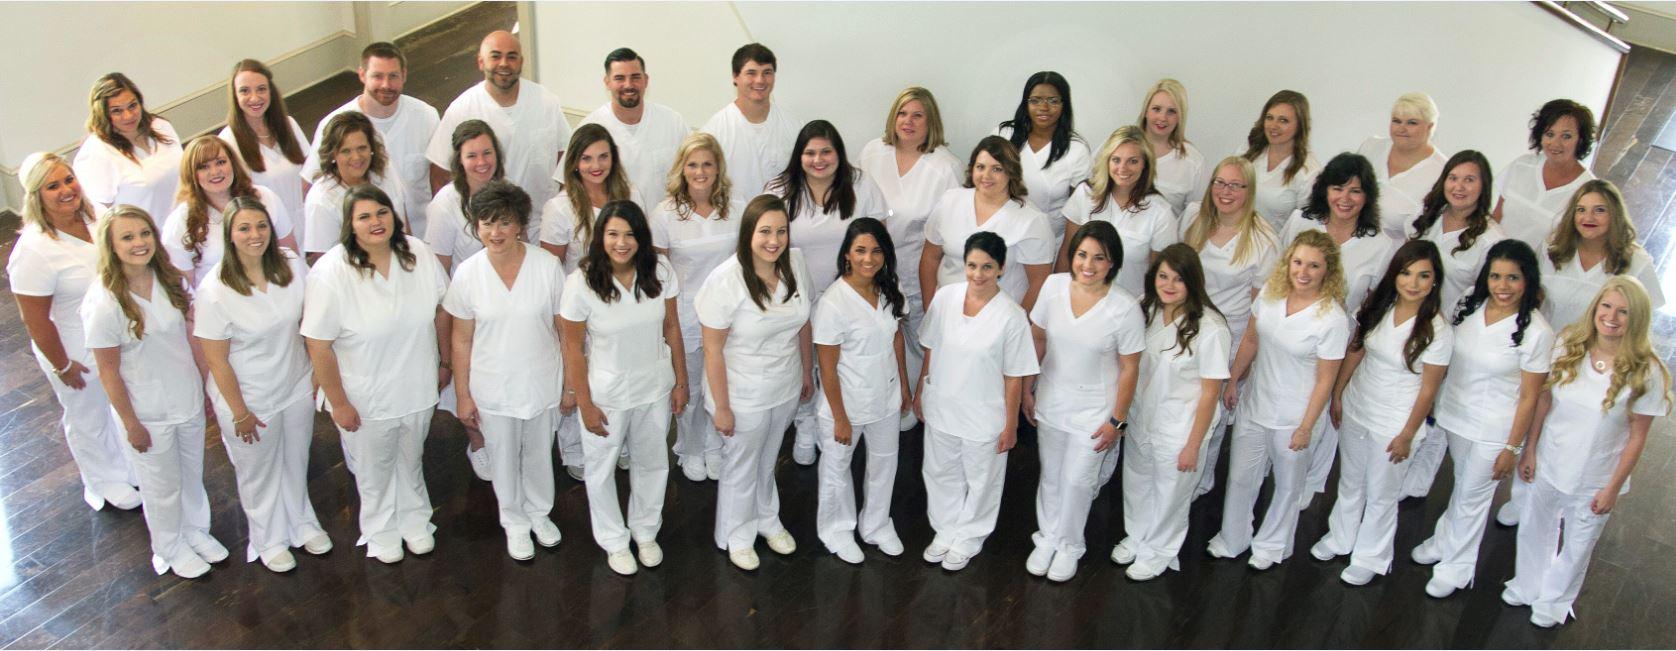 NACC Nursing Program Graduates